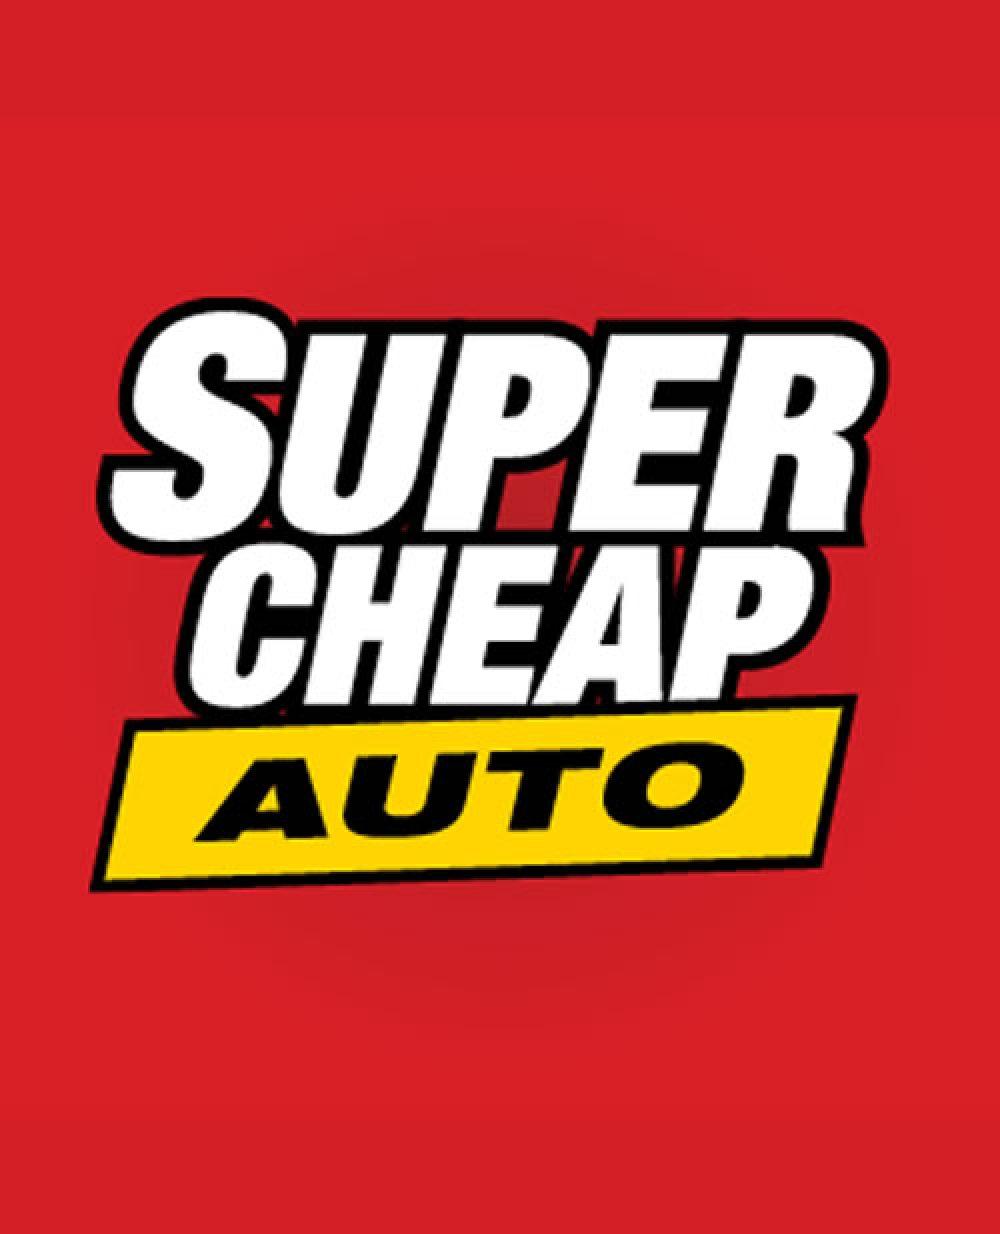 supercheap-auto-parts_logo-1956317822.jpg